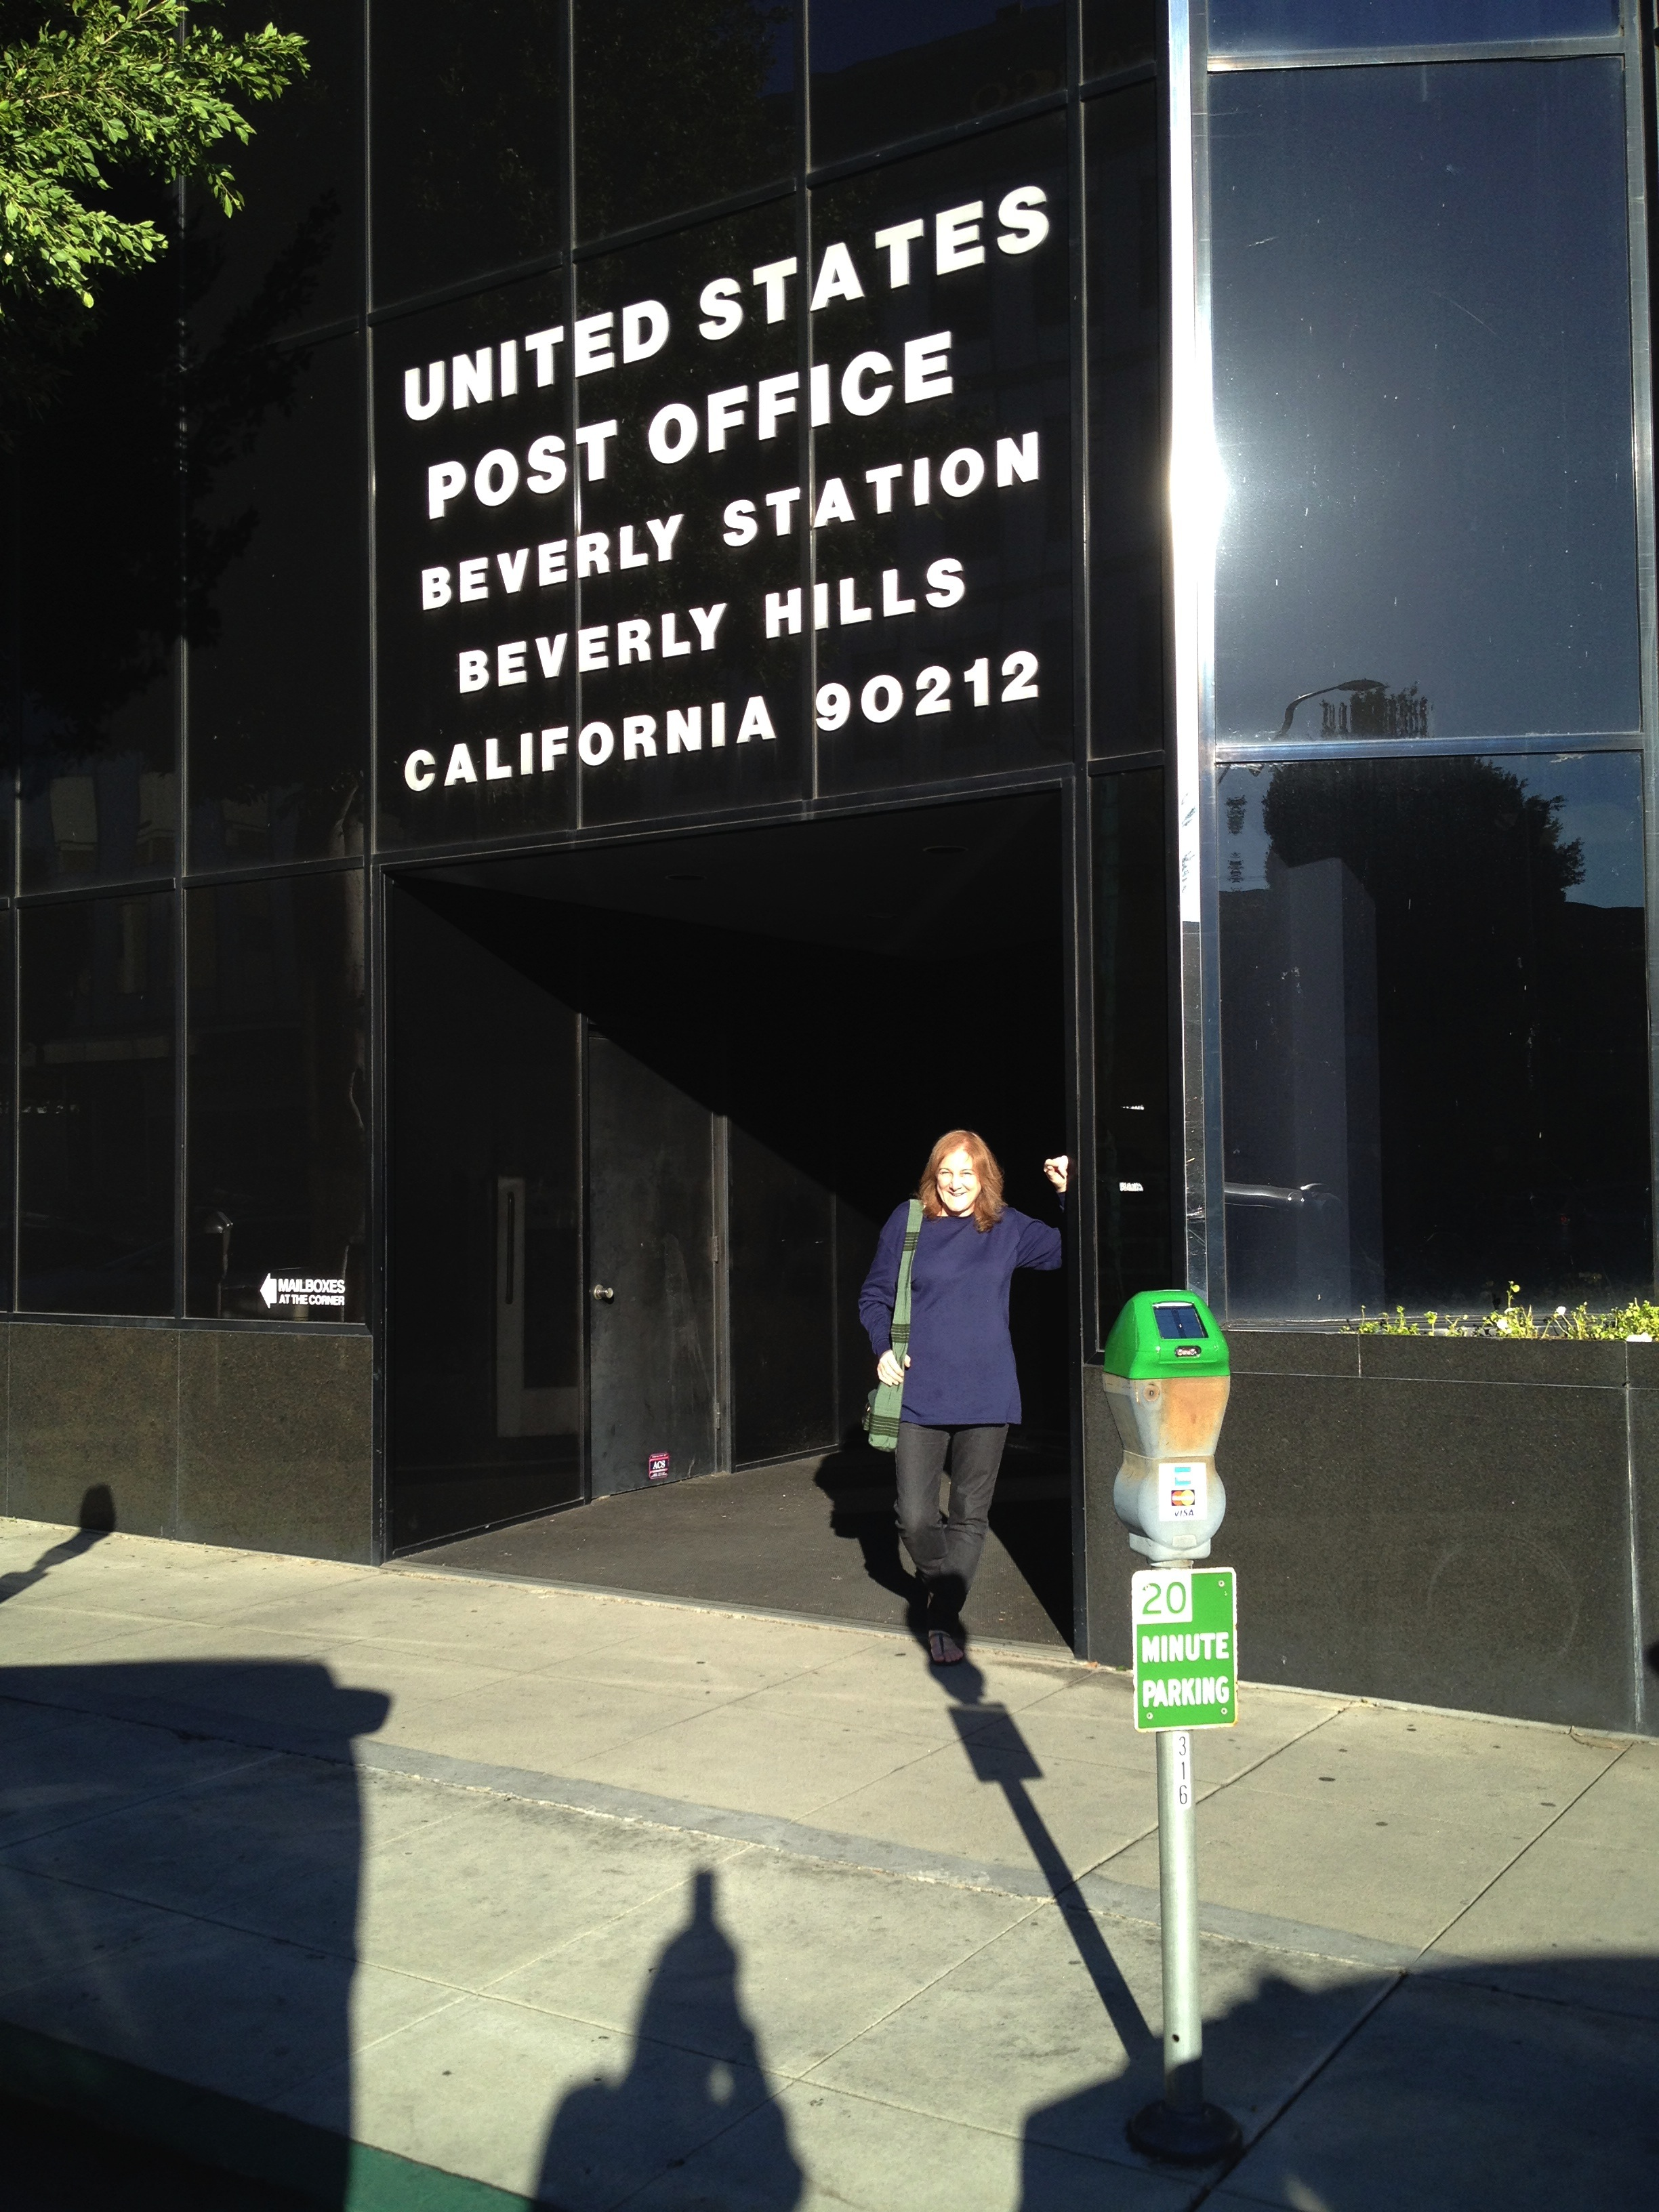 Keyport Post Office Beverly Hills 90212 Post Office